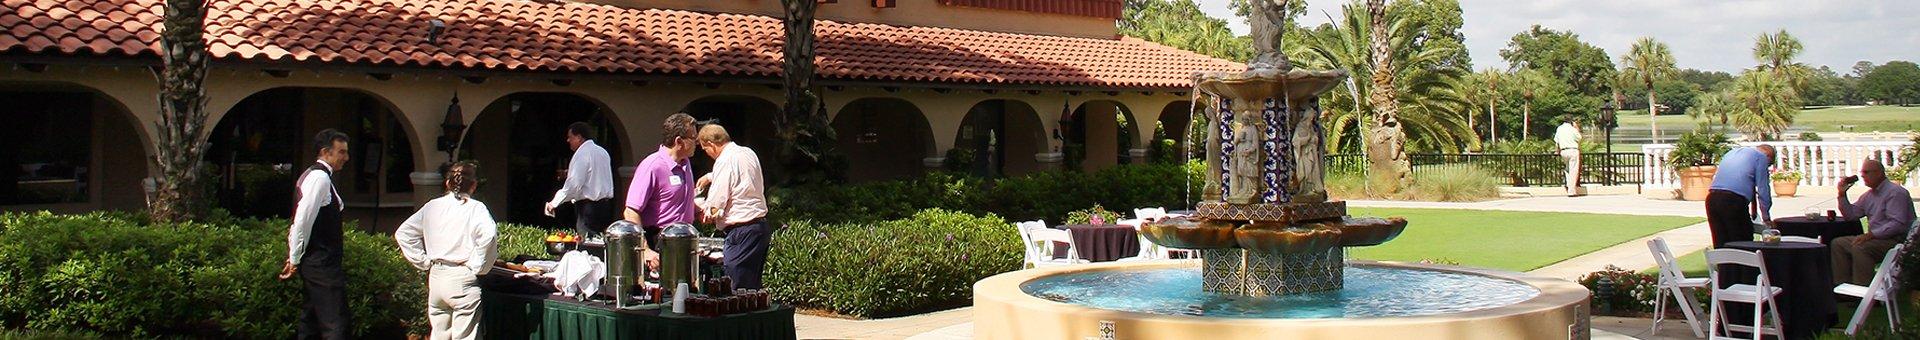 meeting & events near Orlando, Florida